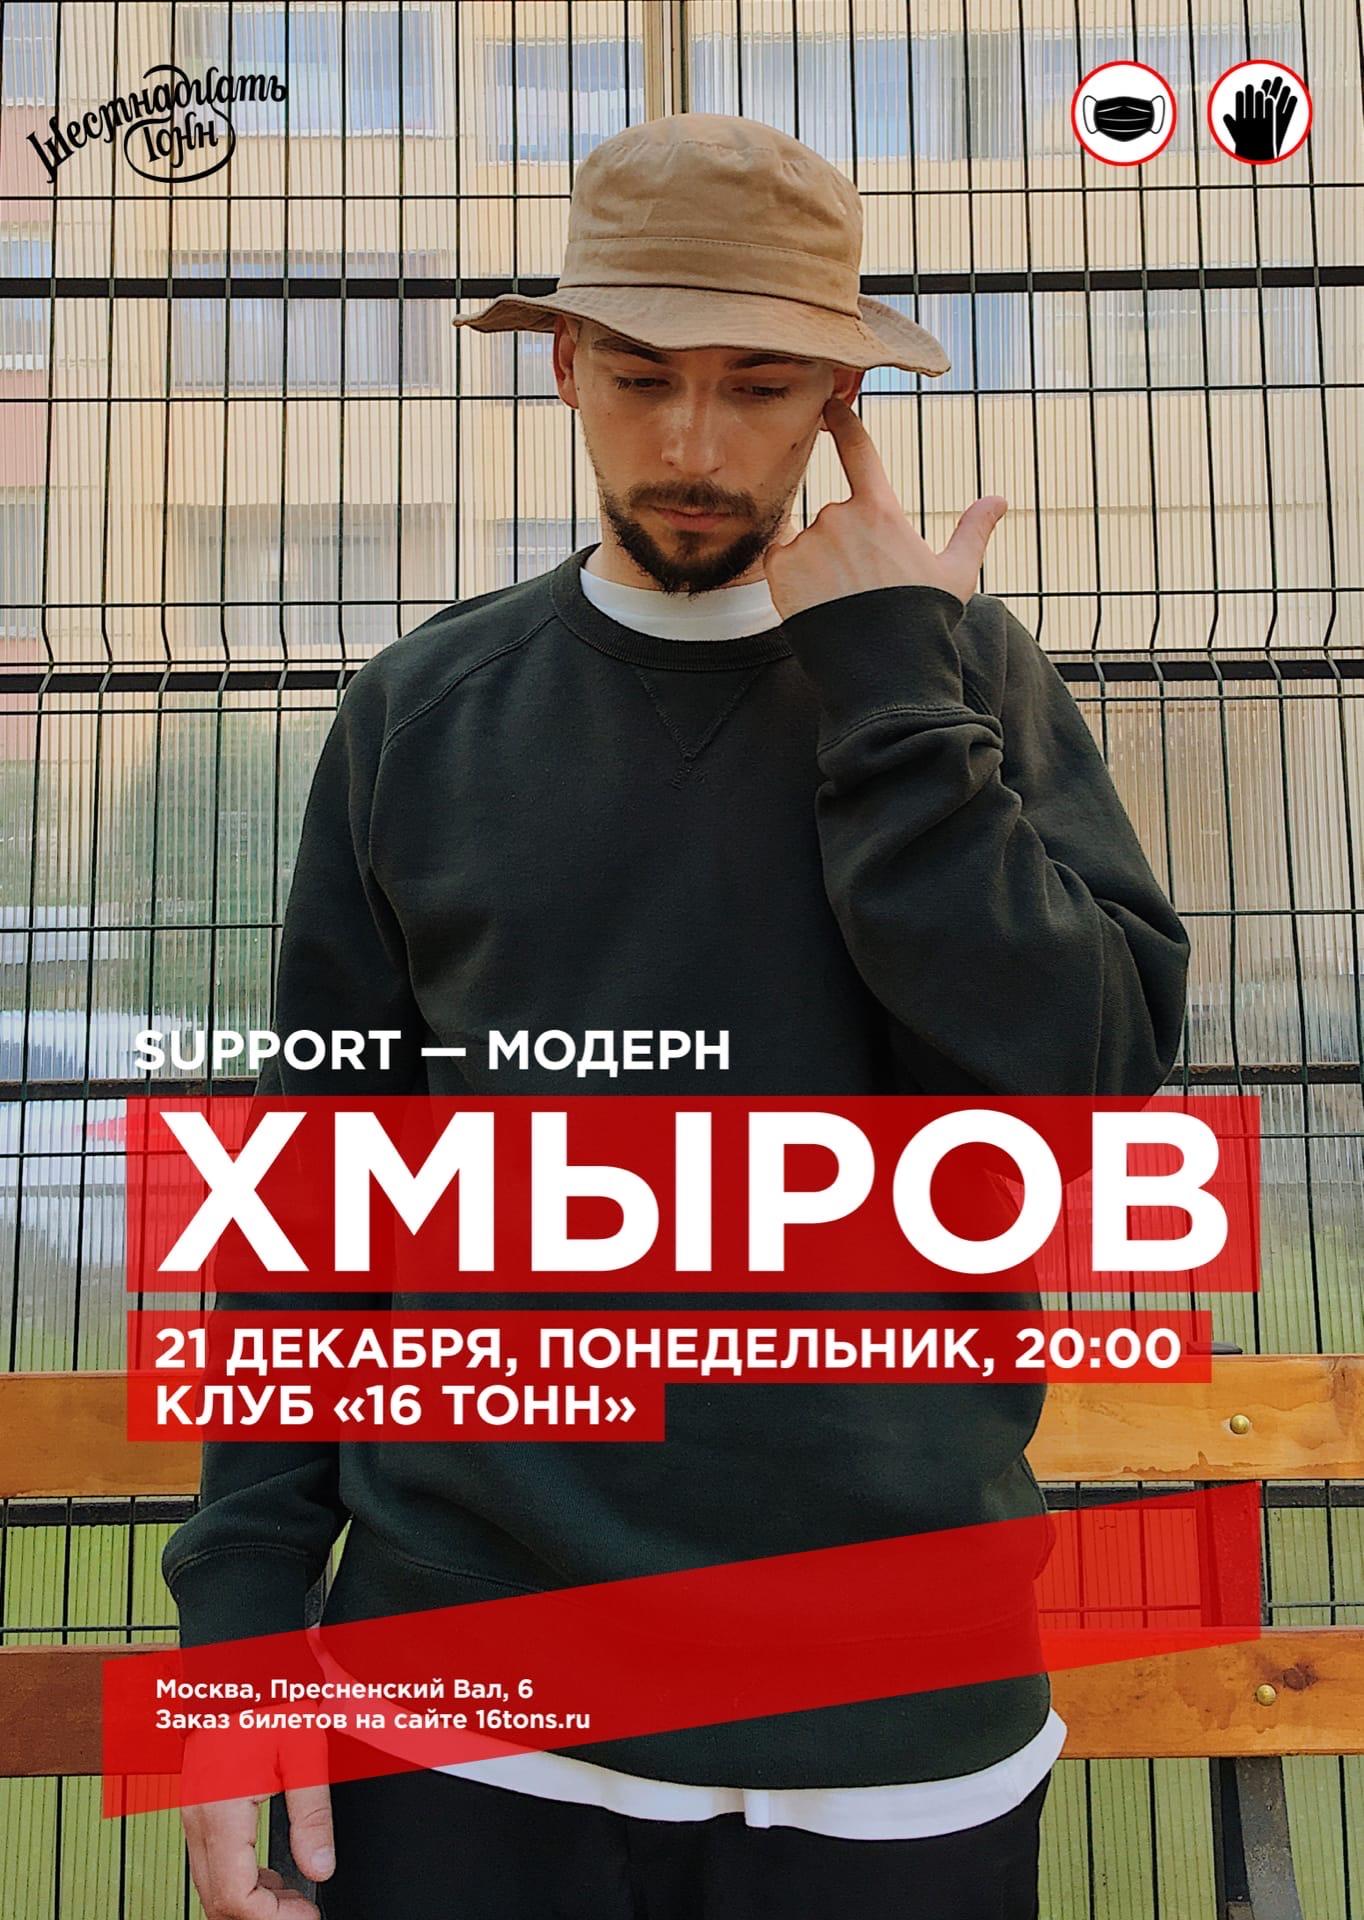 Хмыров